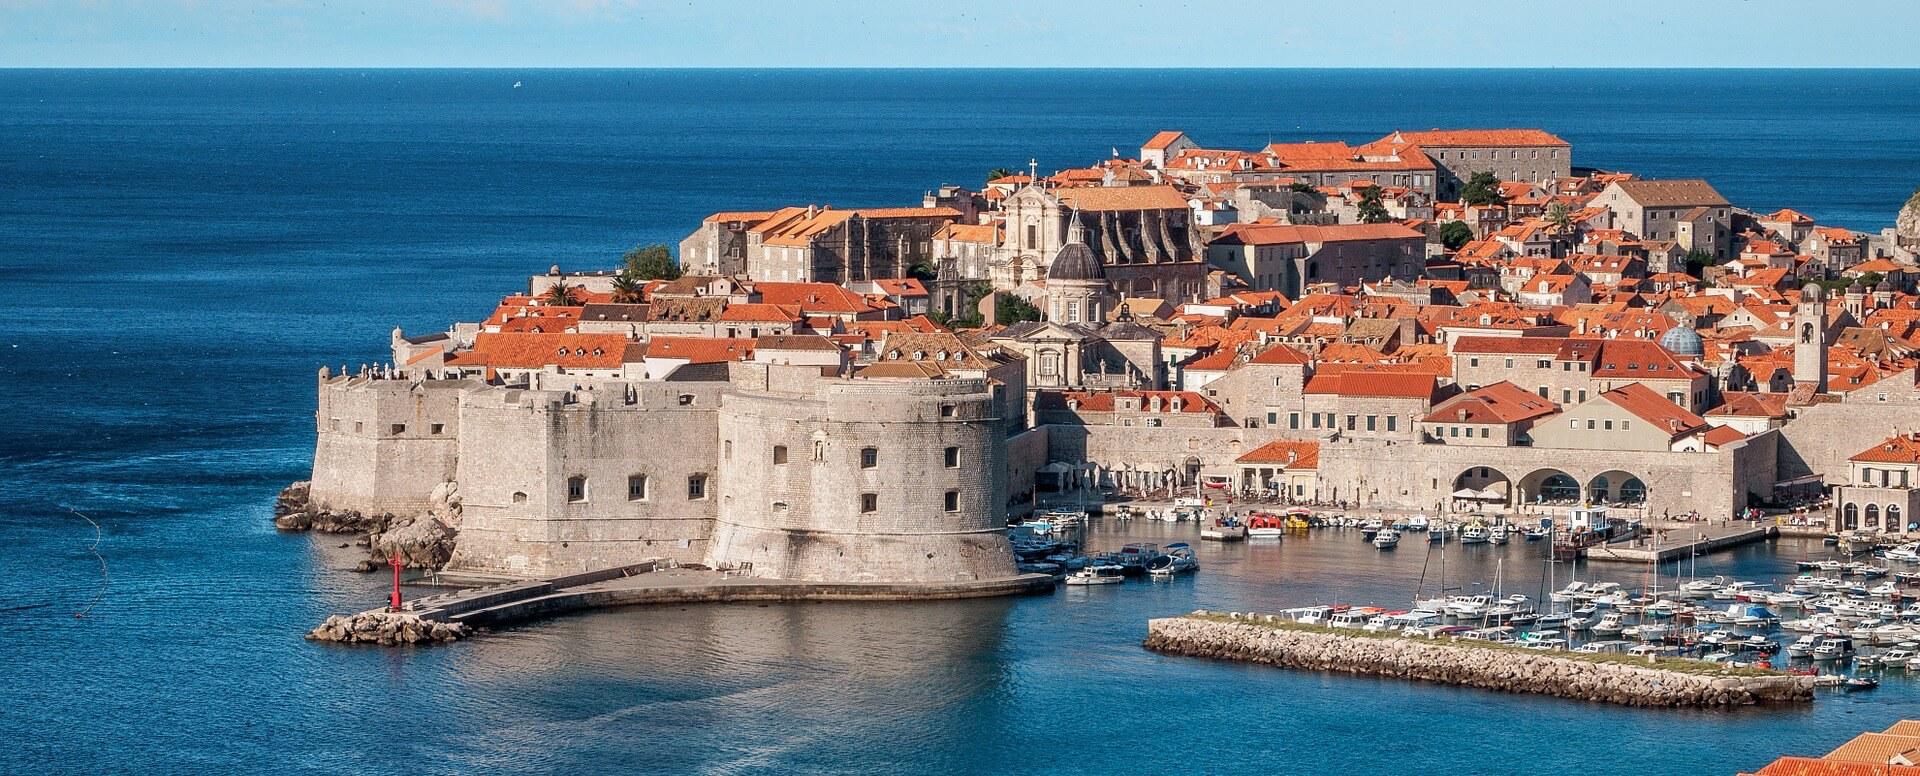 Culture and Tradition in Croatia - Croatia